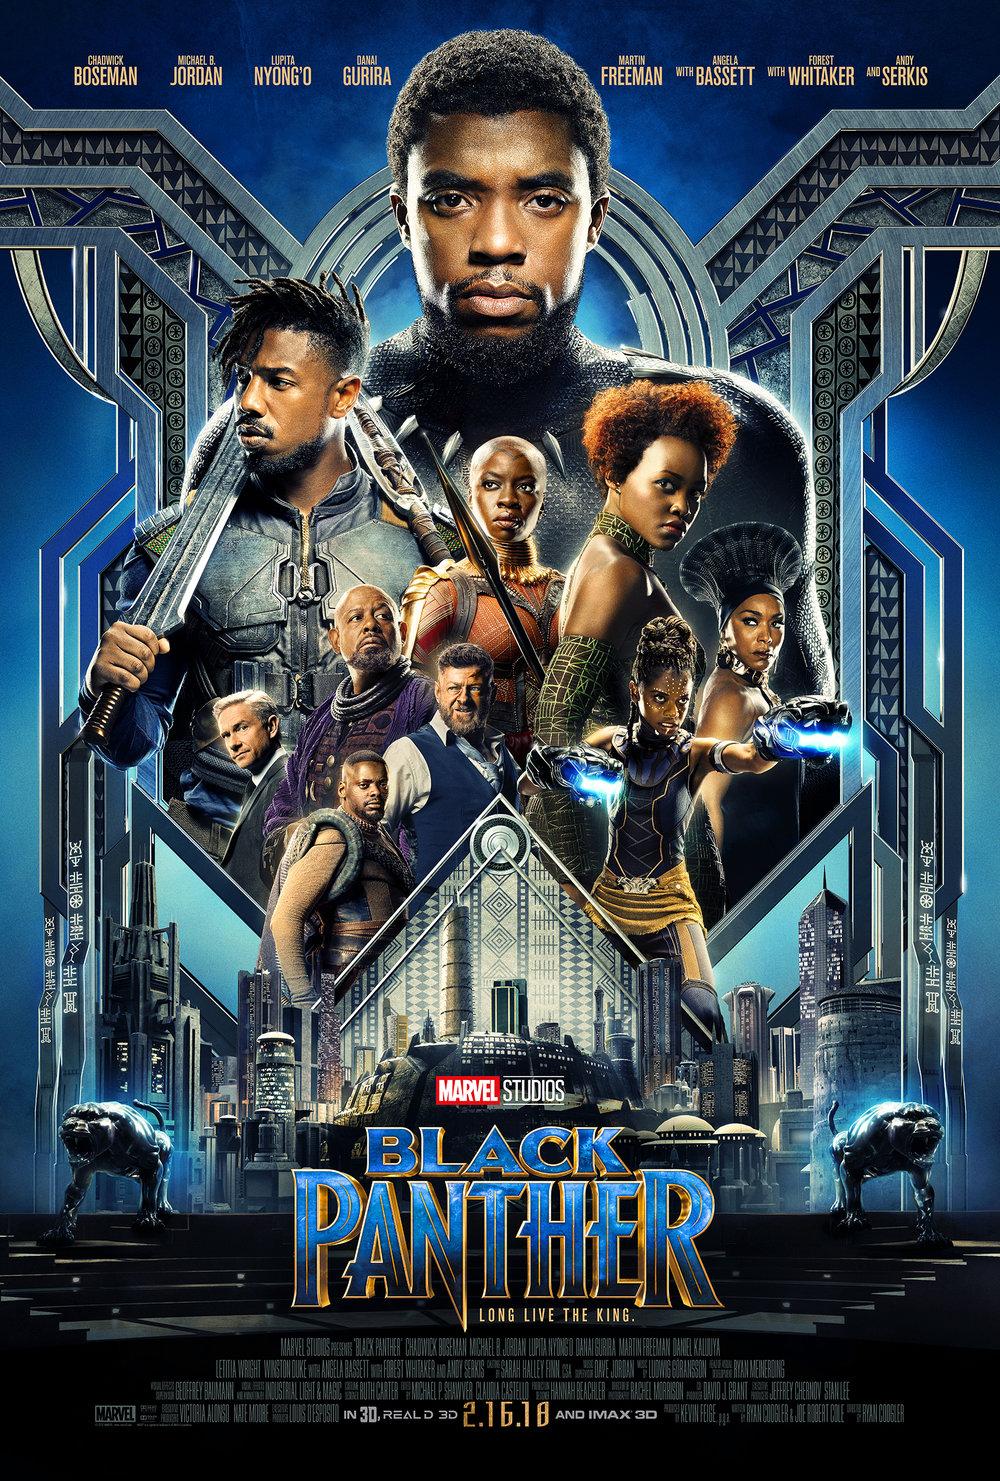 Black Panther 3D Movie Review — 3Dor2D.com